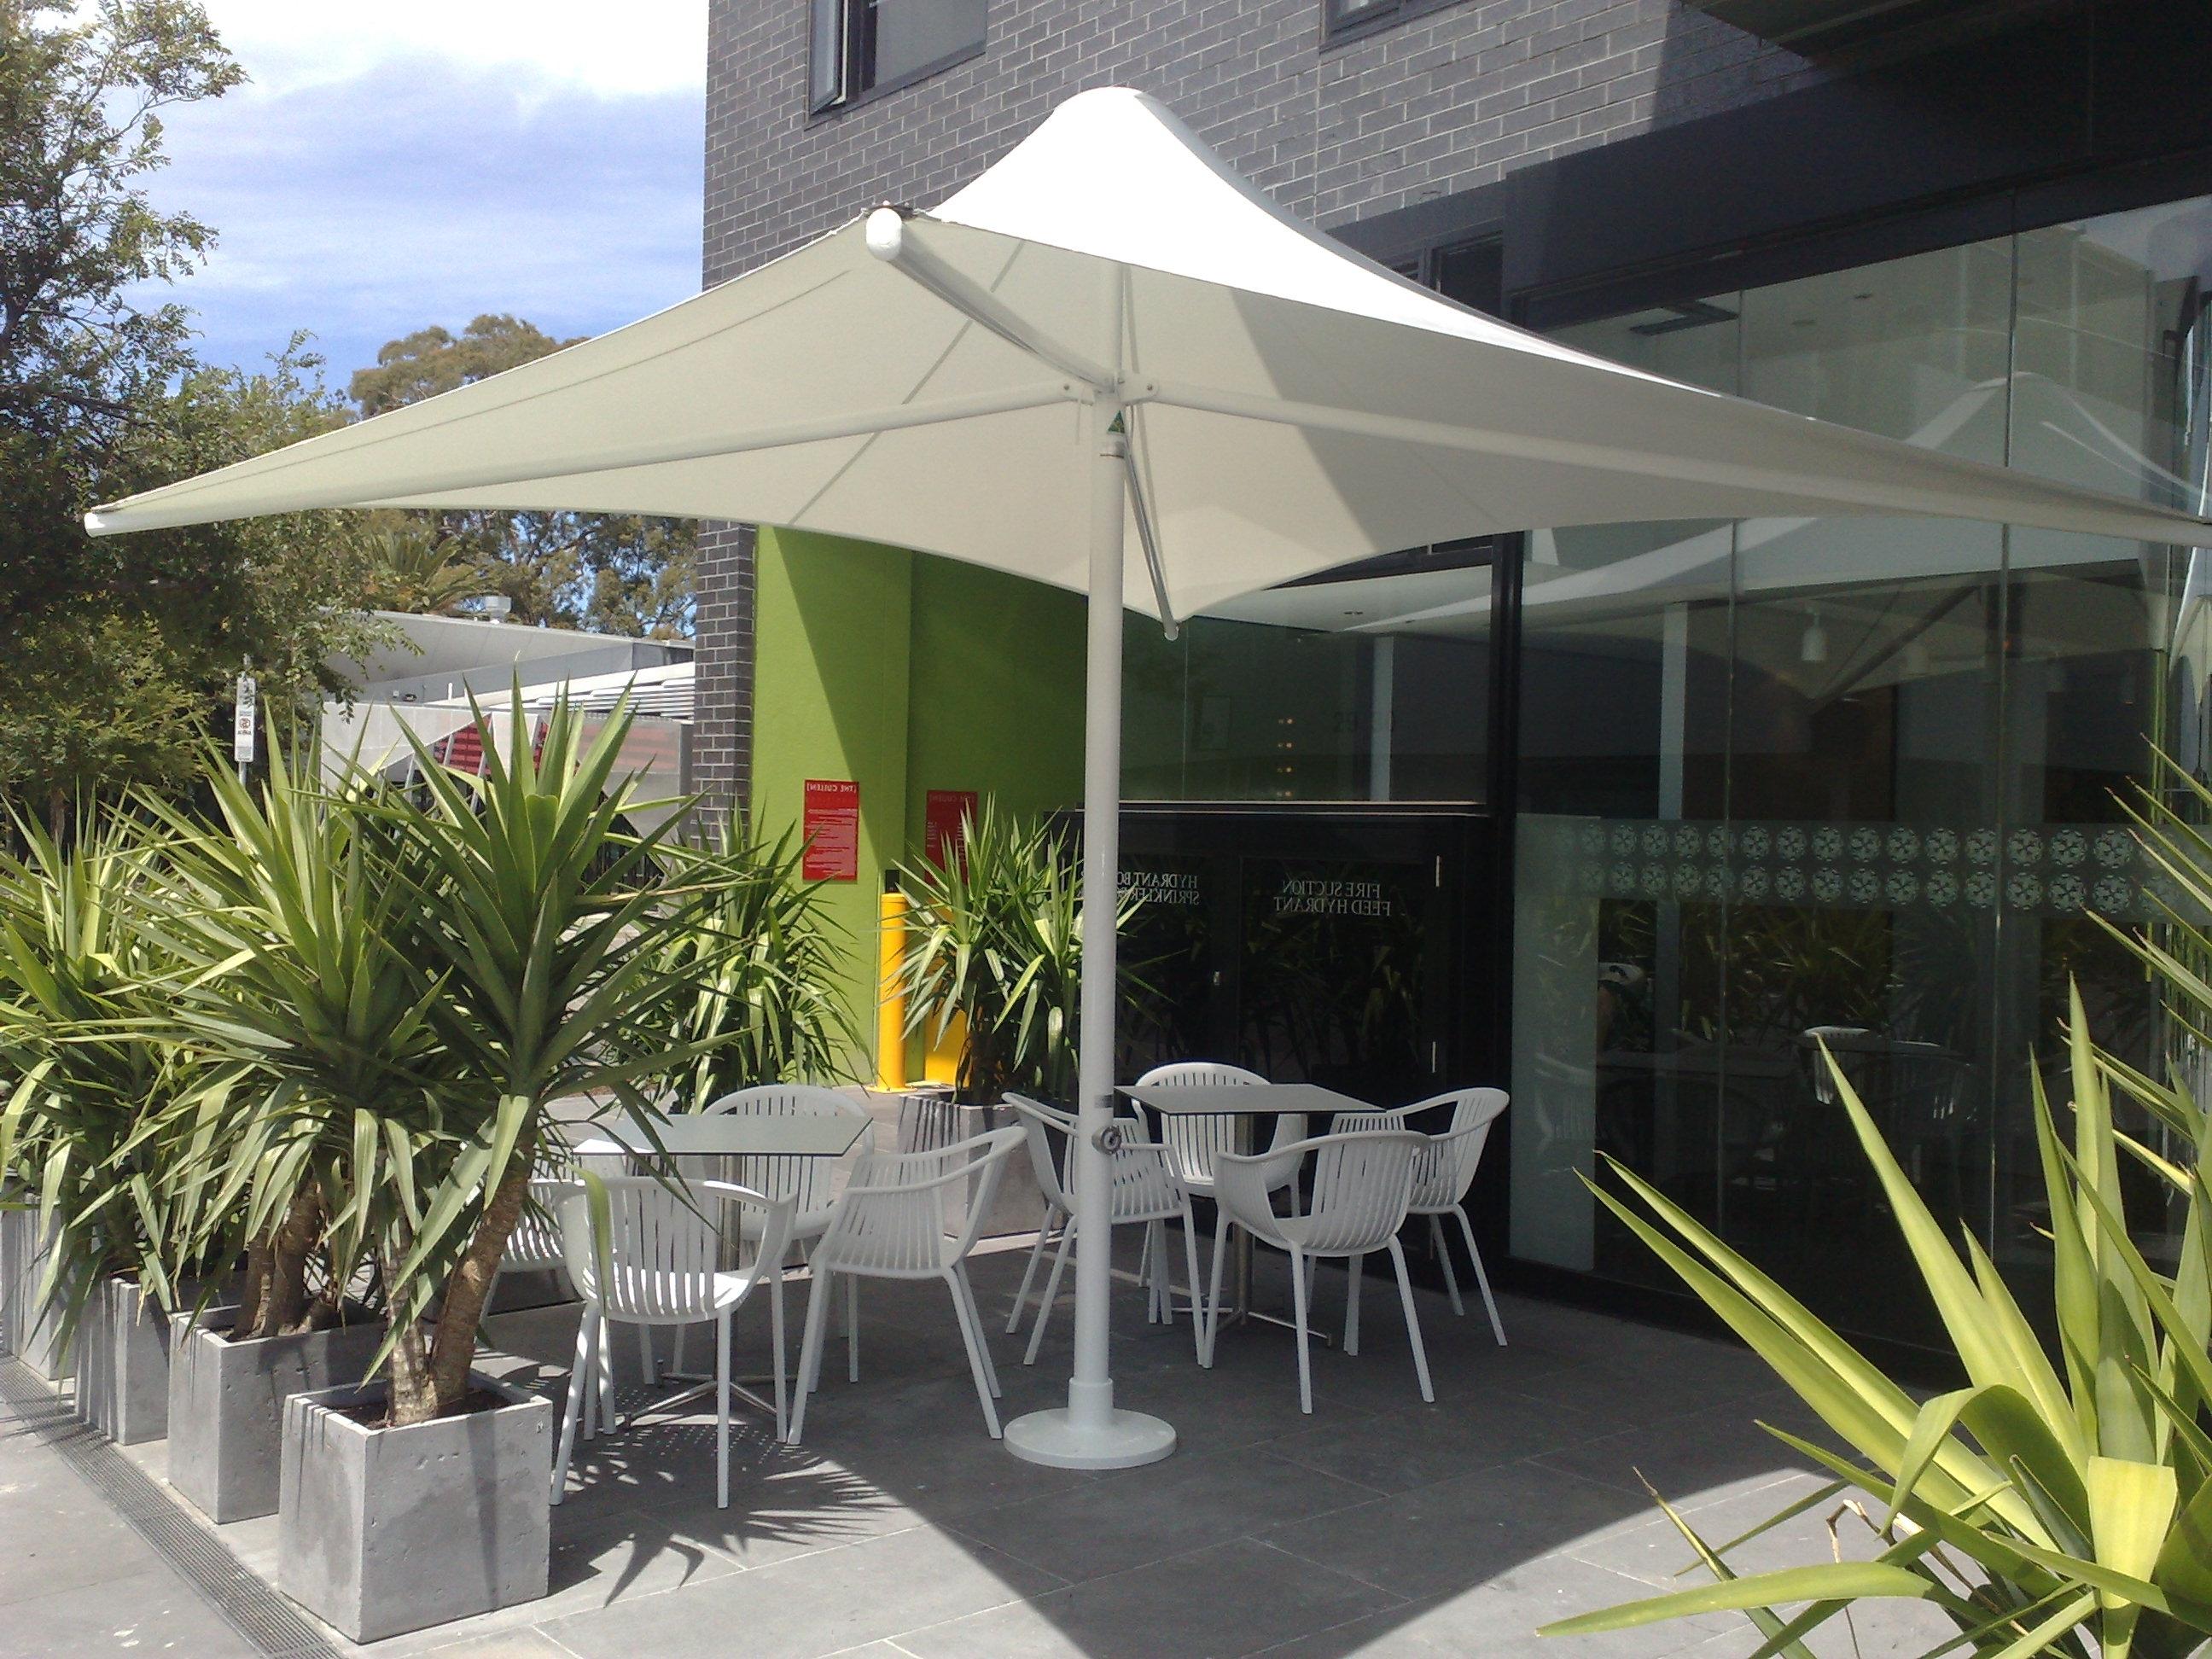 2018 Extra Large Patio Umbrellas Within Patio Umbrella Net – I Send (View 20 of 20)